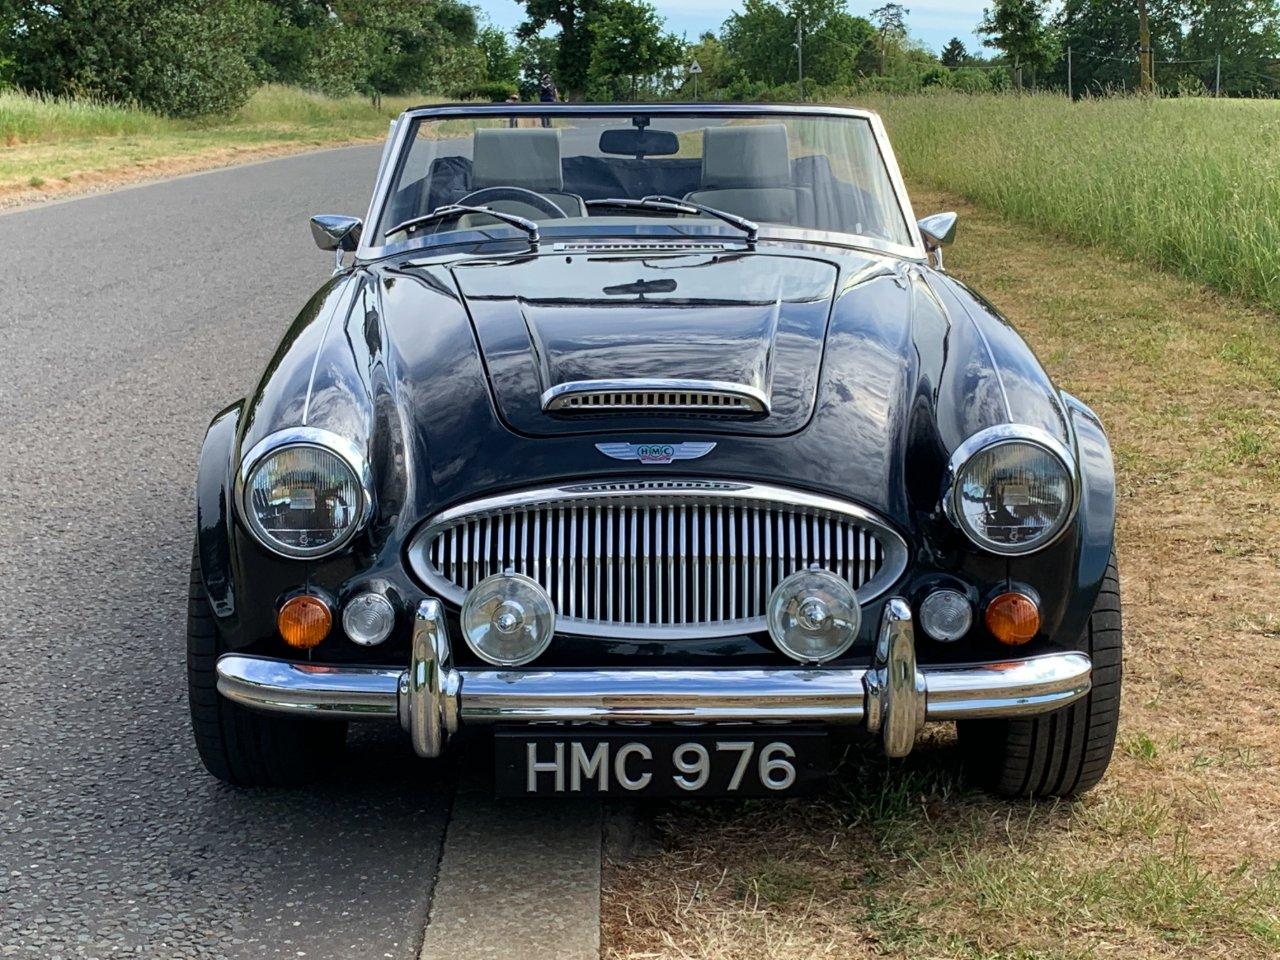 1996 HMC MK IV SE Convertible For Sale (picture 2 of 6)